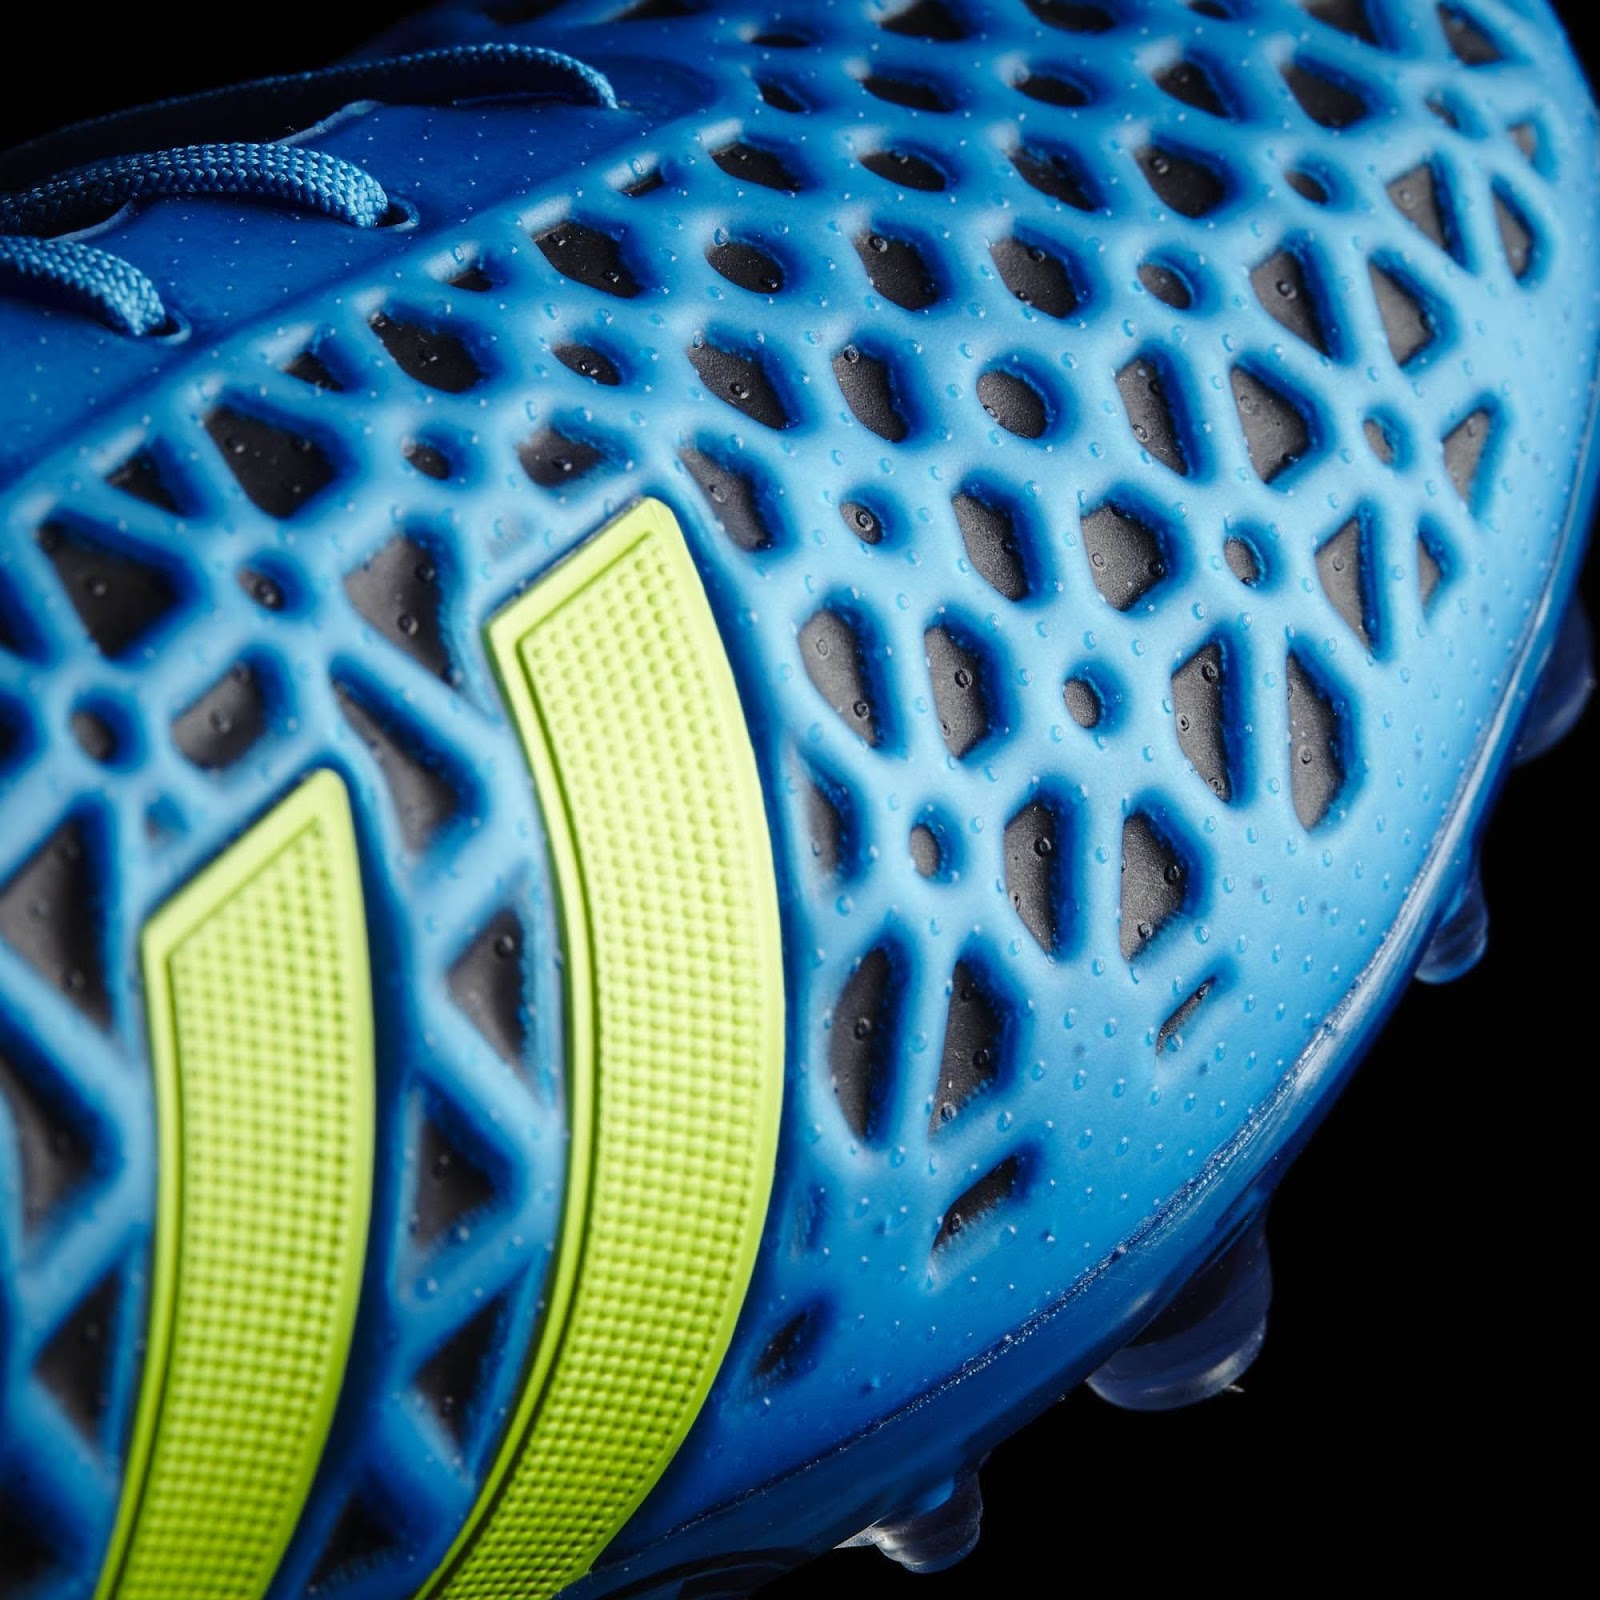 e2ced0ffe new adidas football boots 2015